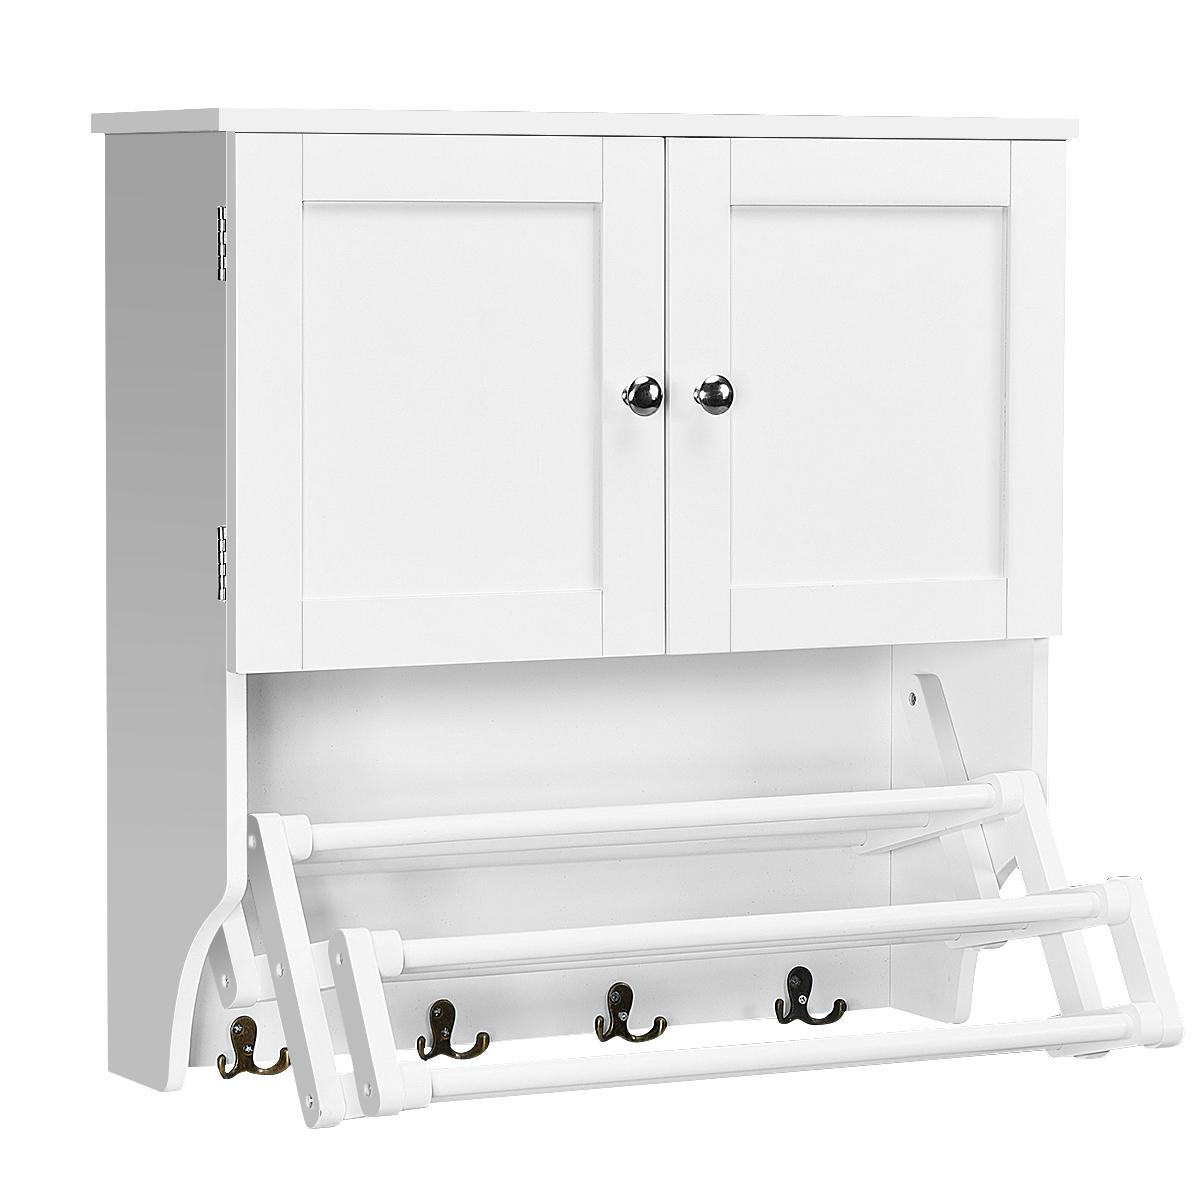 Costway Bathroom Wall Cabinet Wtowel Bar And Stretchable Shelf Storage Pine Rack White inside measurements 1200 X 1200